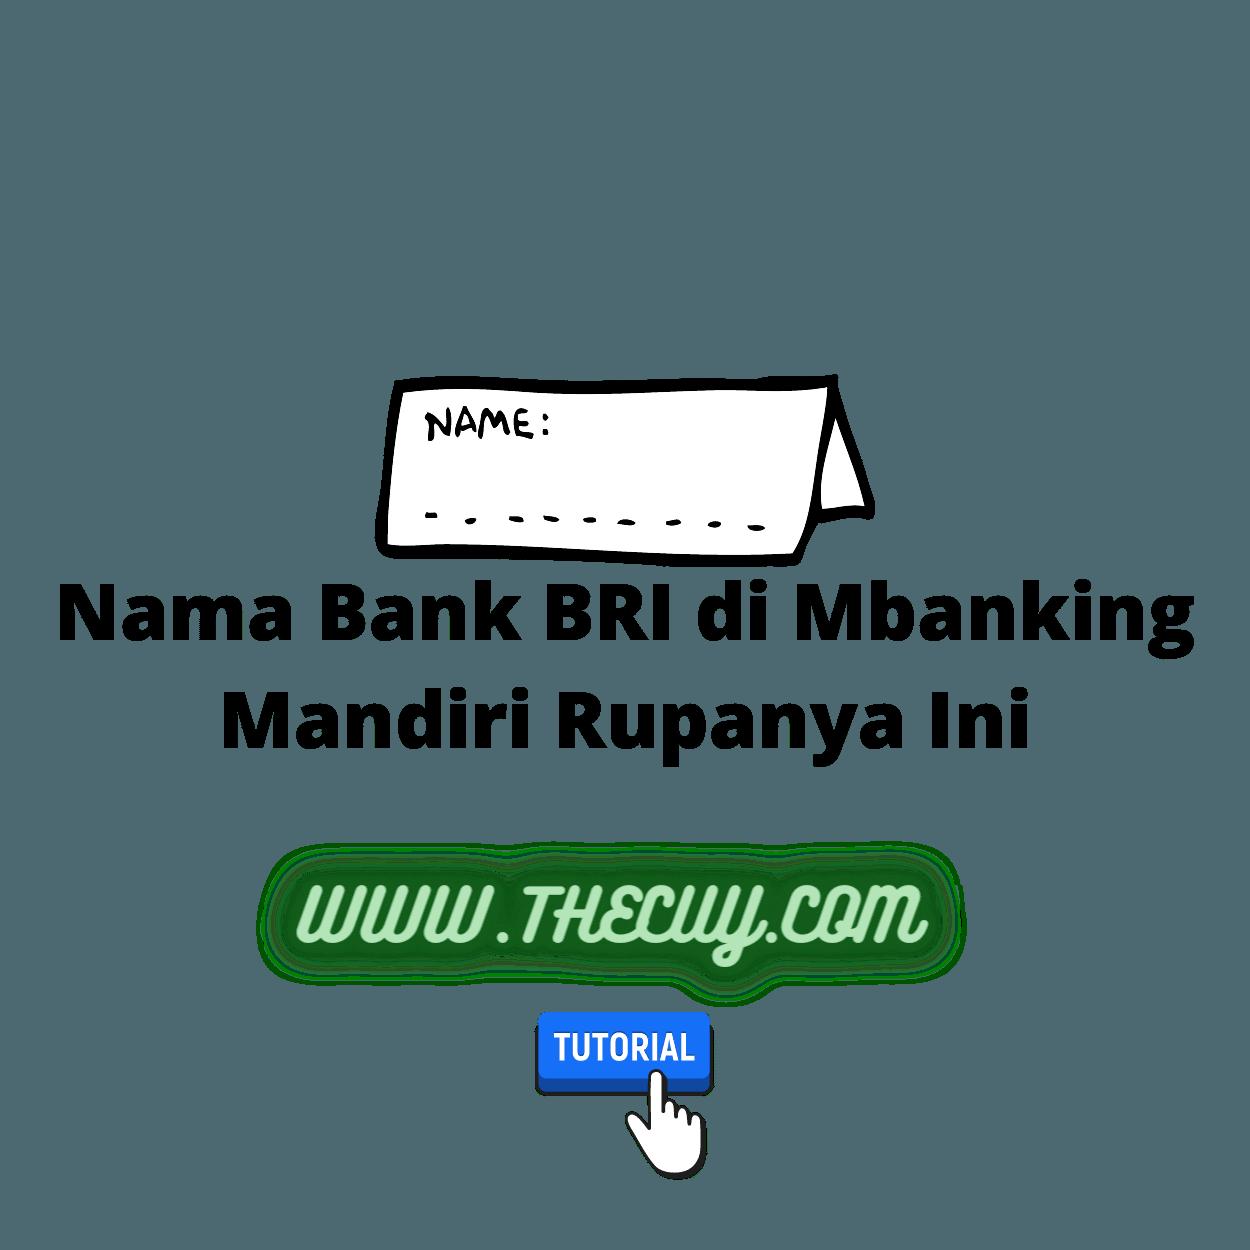 Nama Bank BRI di Mbanking Mandiri Rupanya Ini